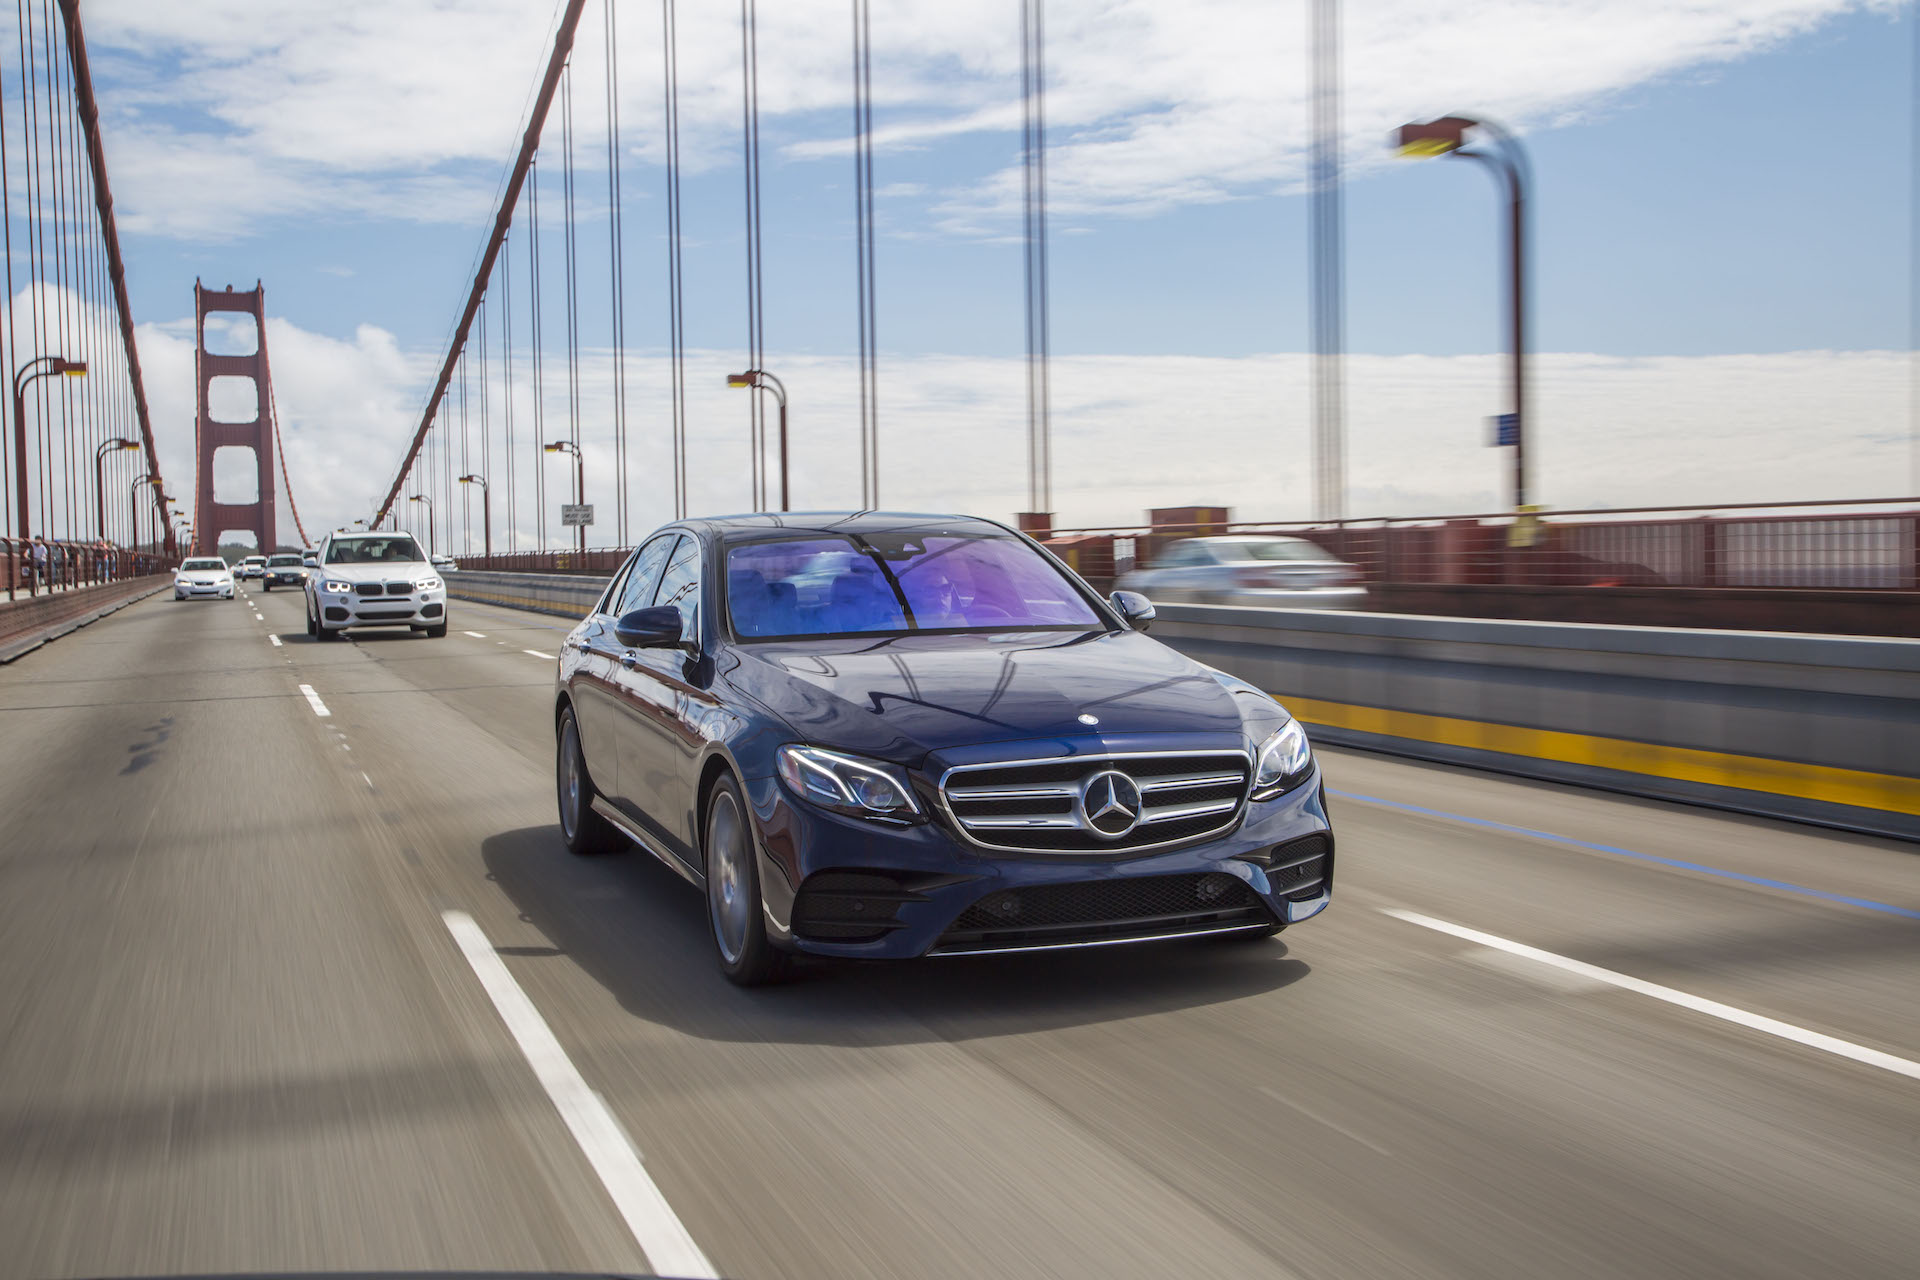 2017 Mercedes-Benz E-Series recalled to fix airbag glitch